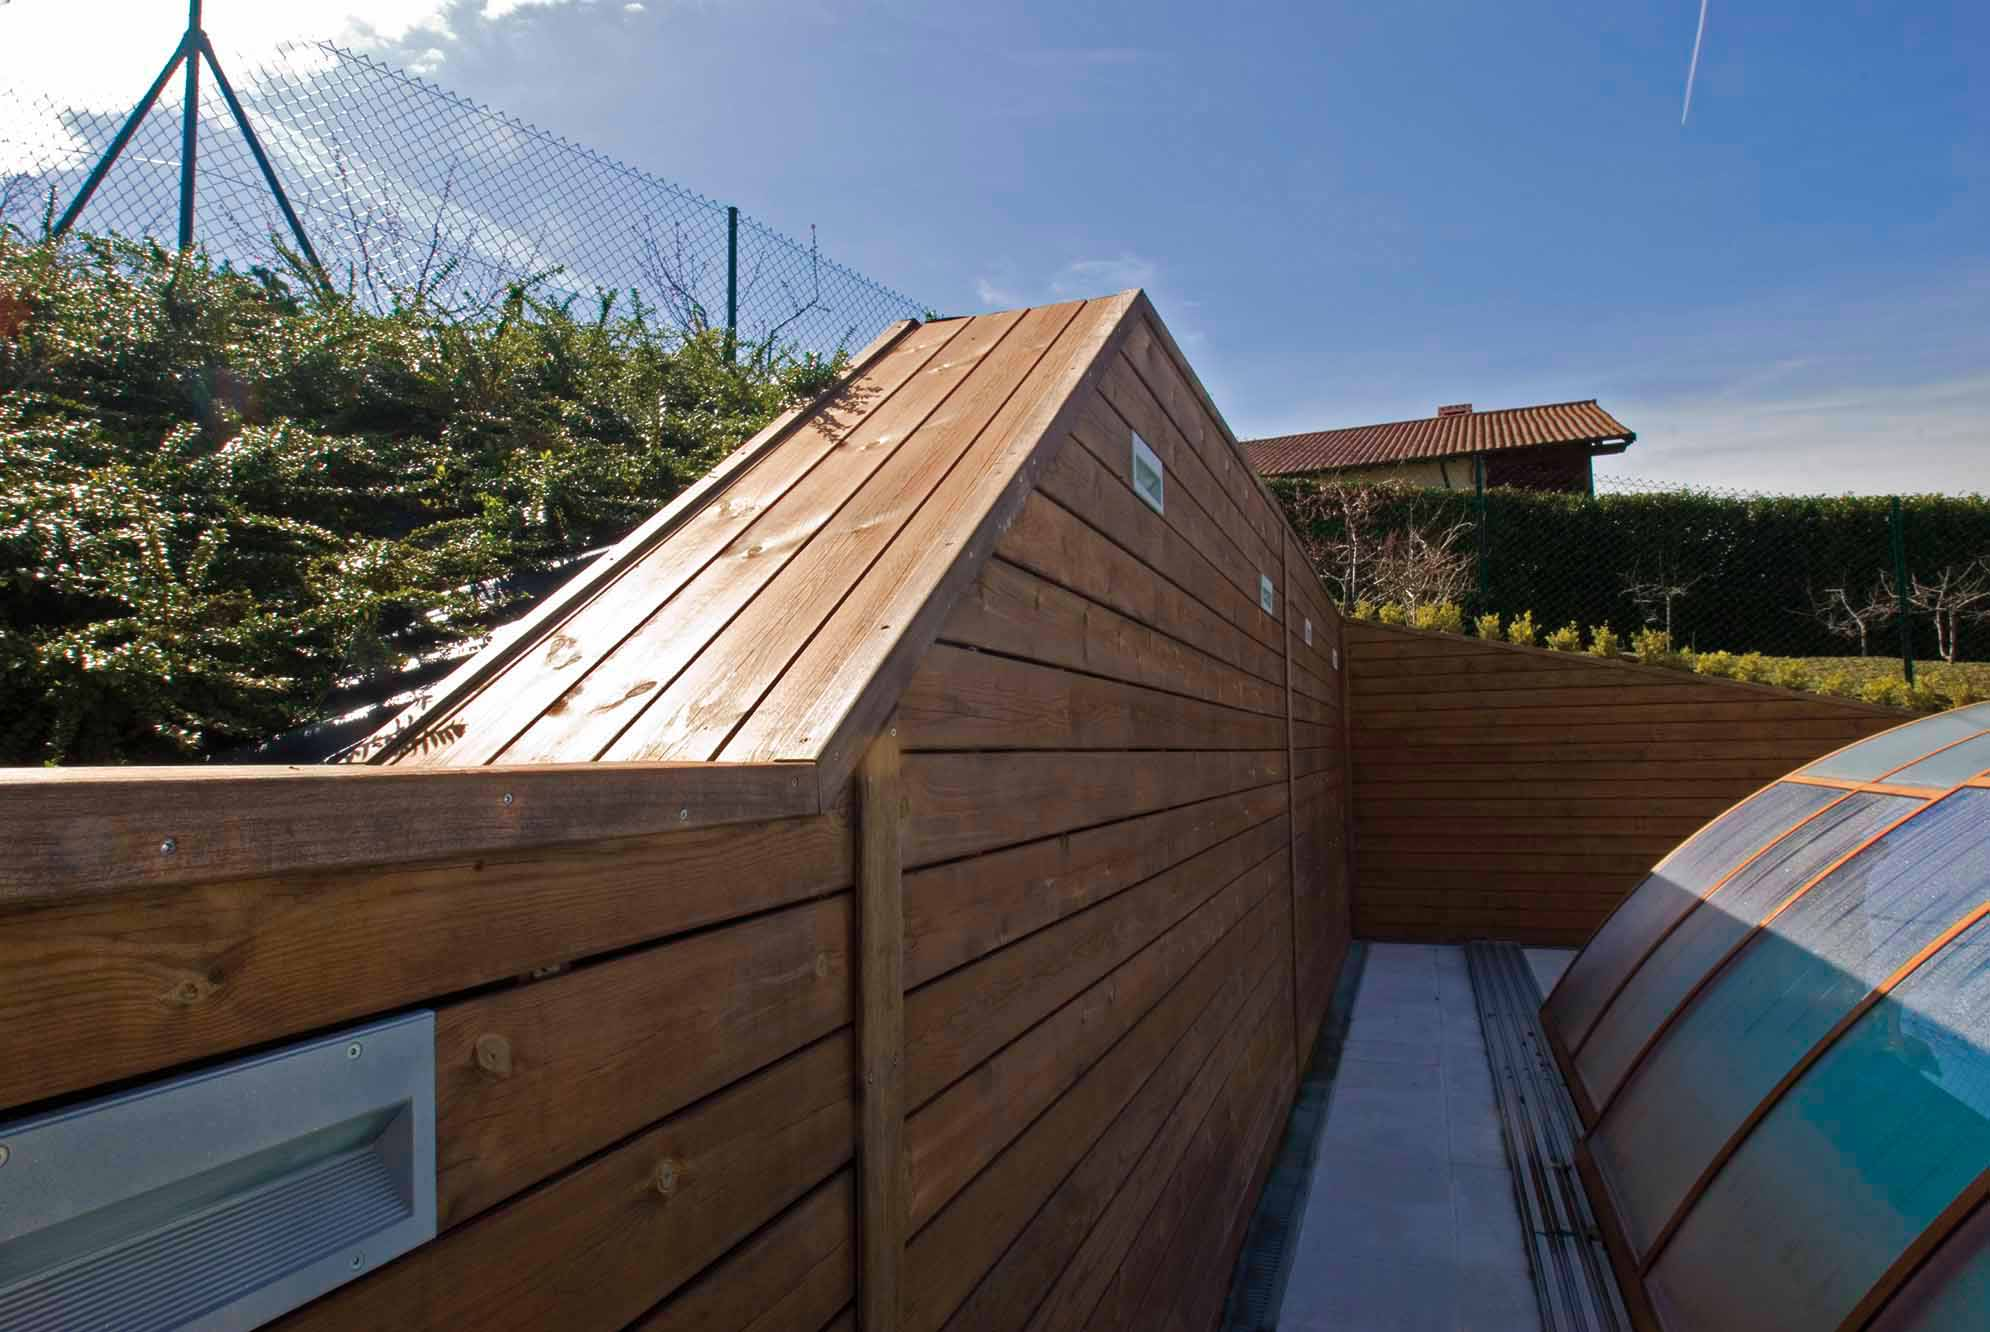 muro-contencion-traviesas-madera-2